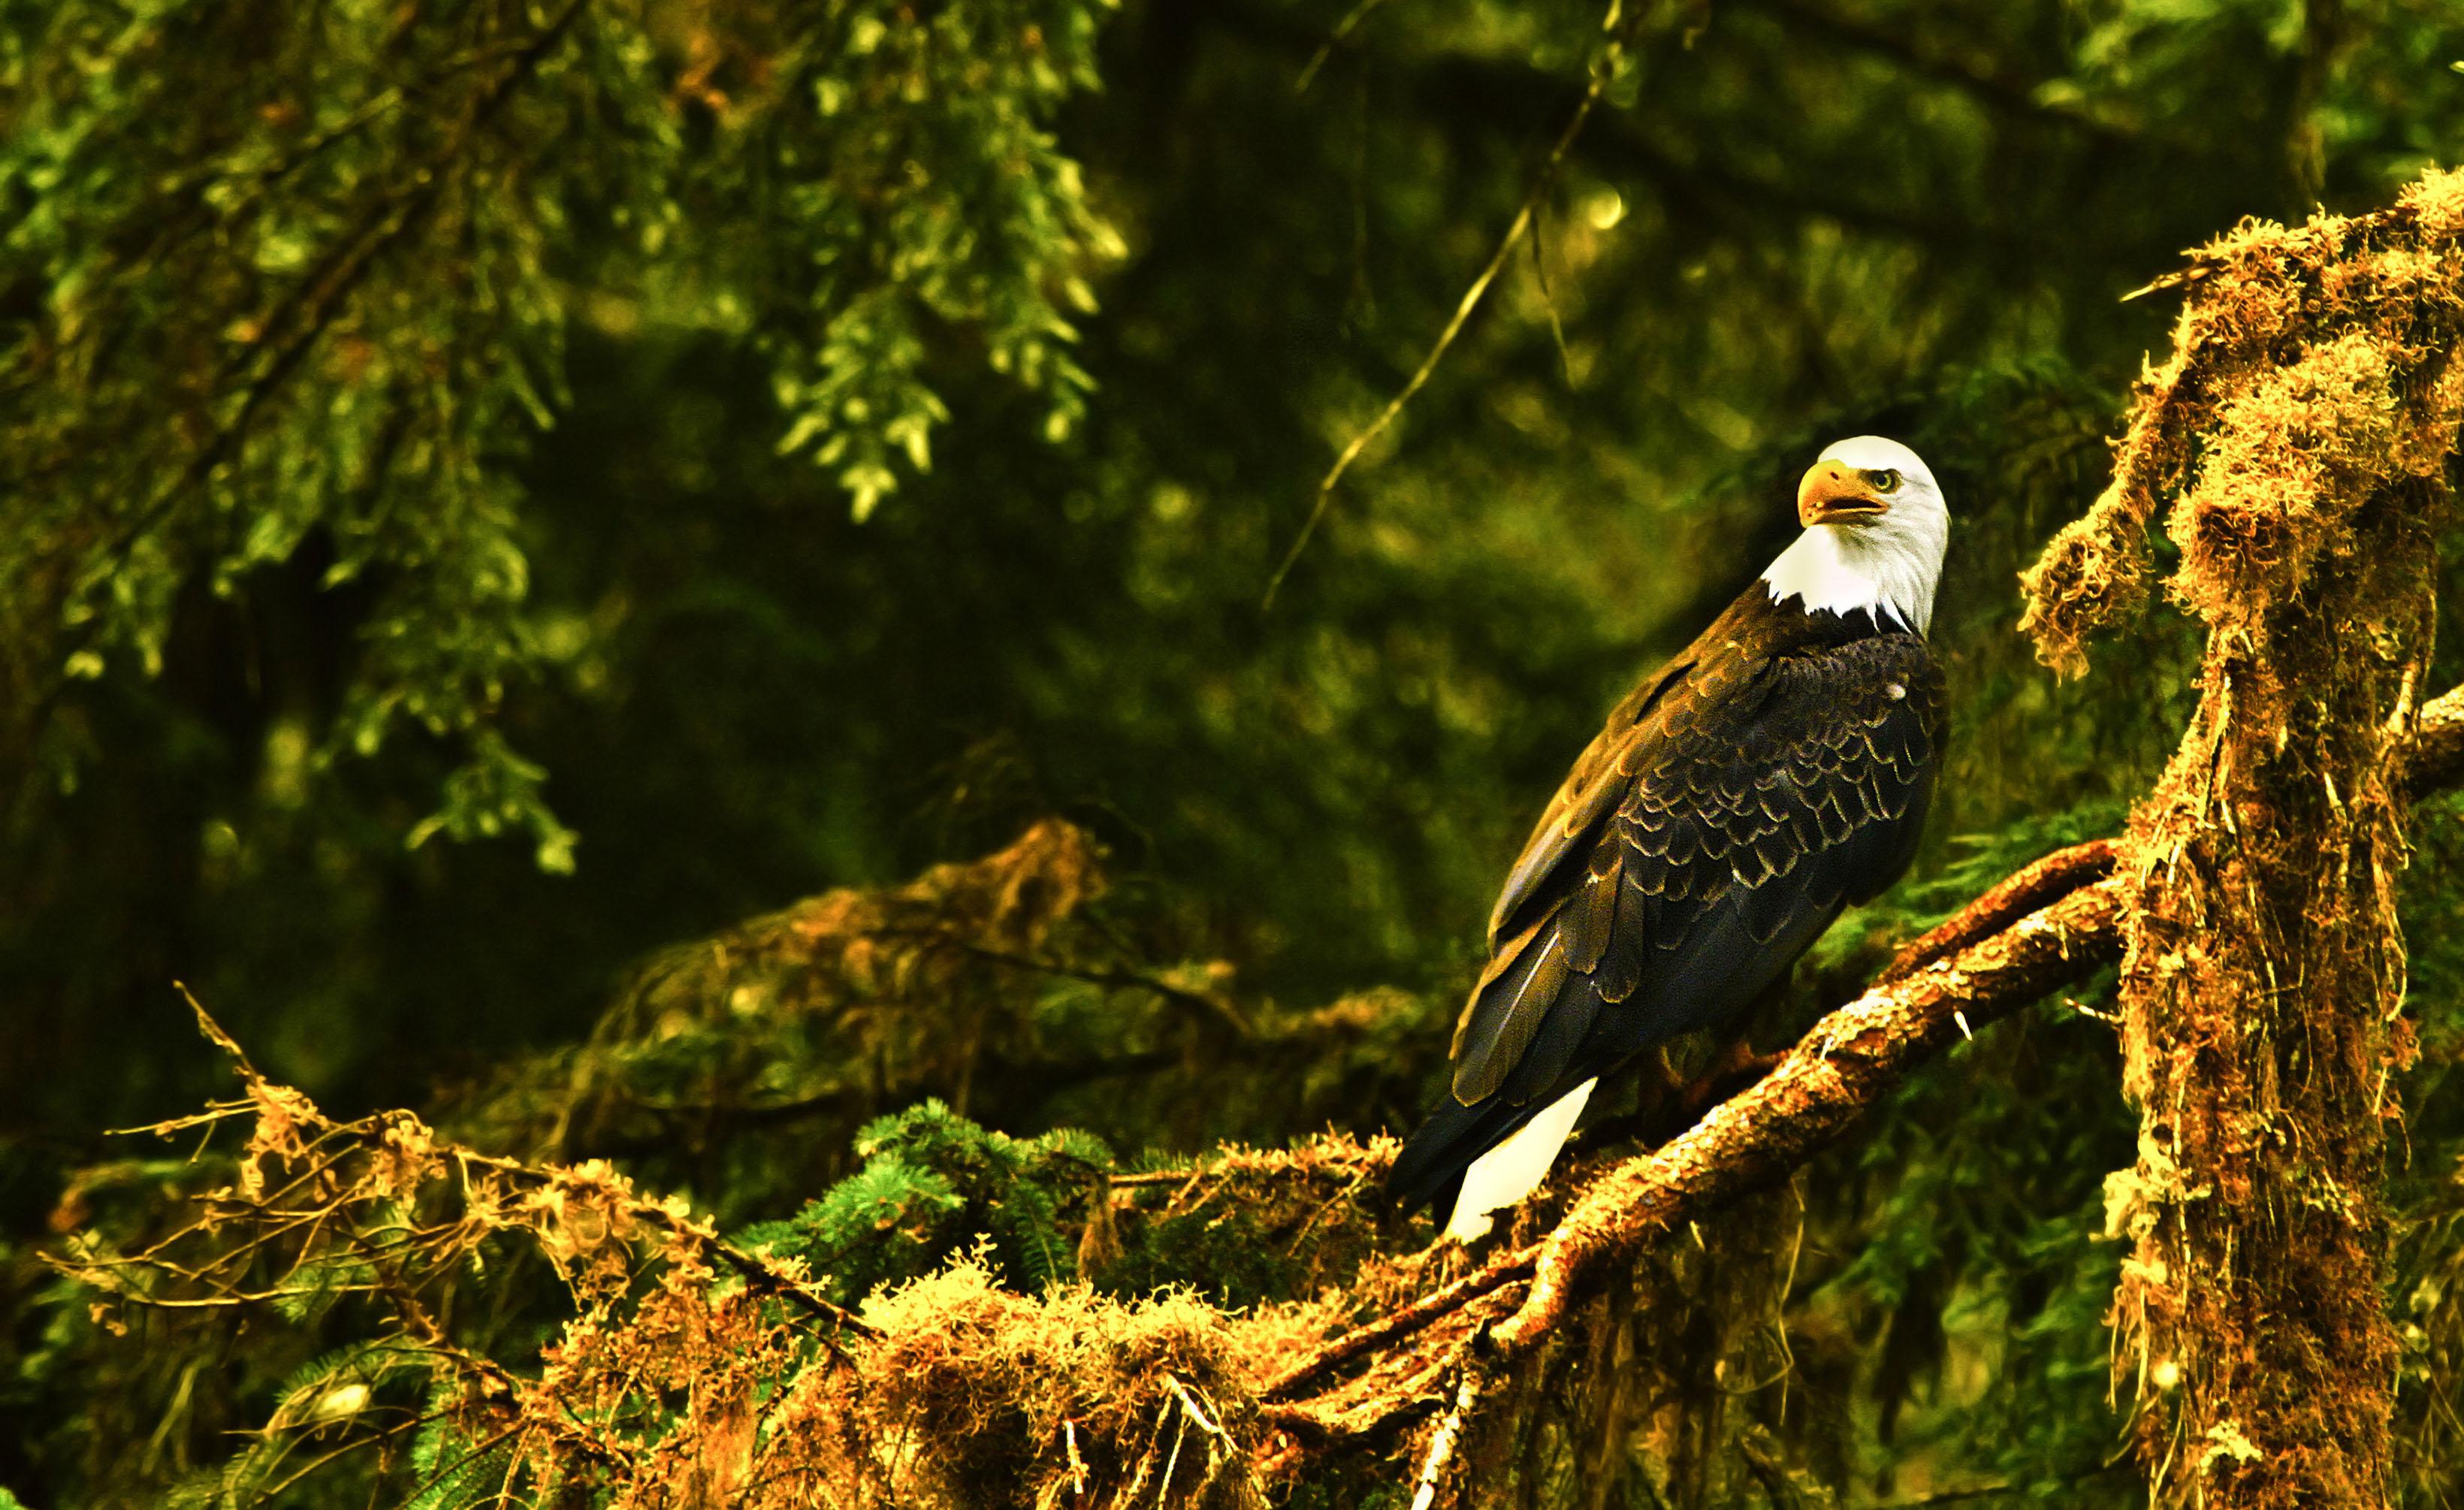 HDoboi.Kiev.ua - Птица орел сидит на ветке в лесу